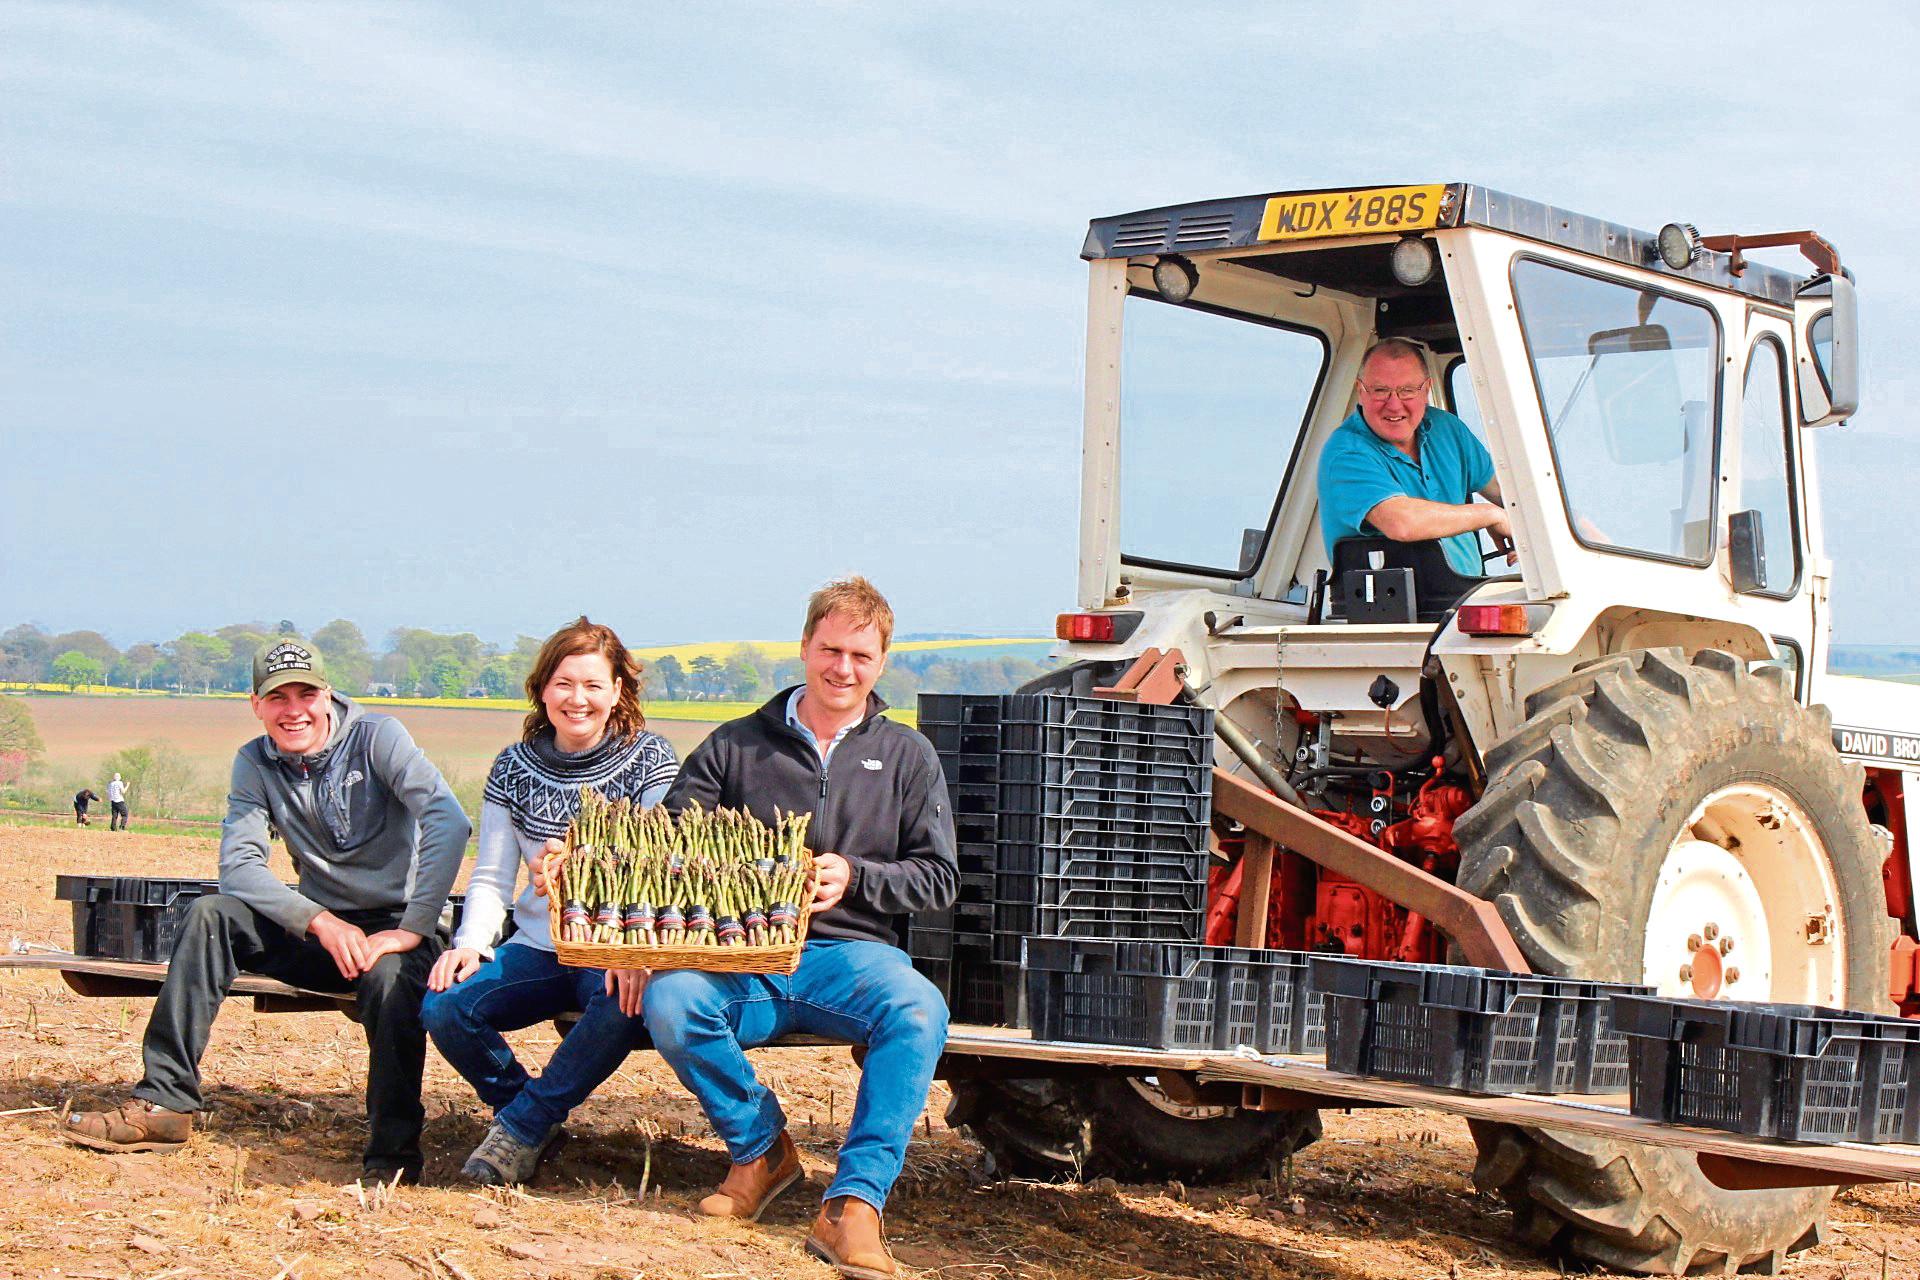 Reece McEwan, Jillian McEwan, Neil McEwan and Raymond McEwan of Myreside Farms Produce.